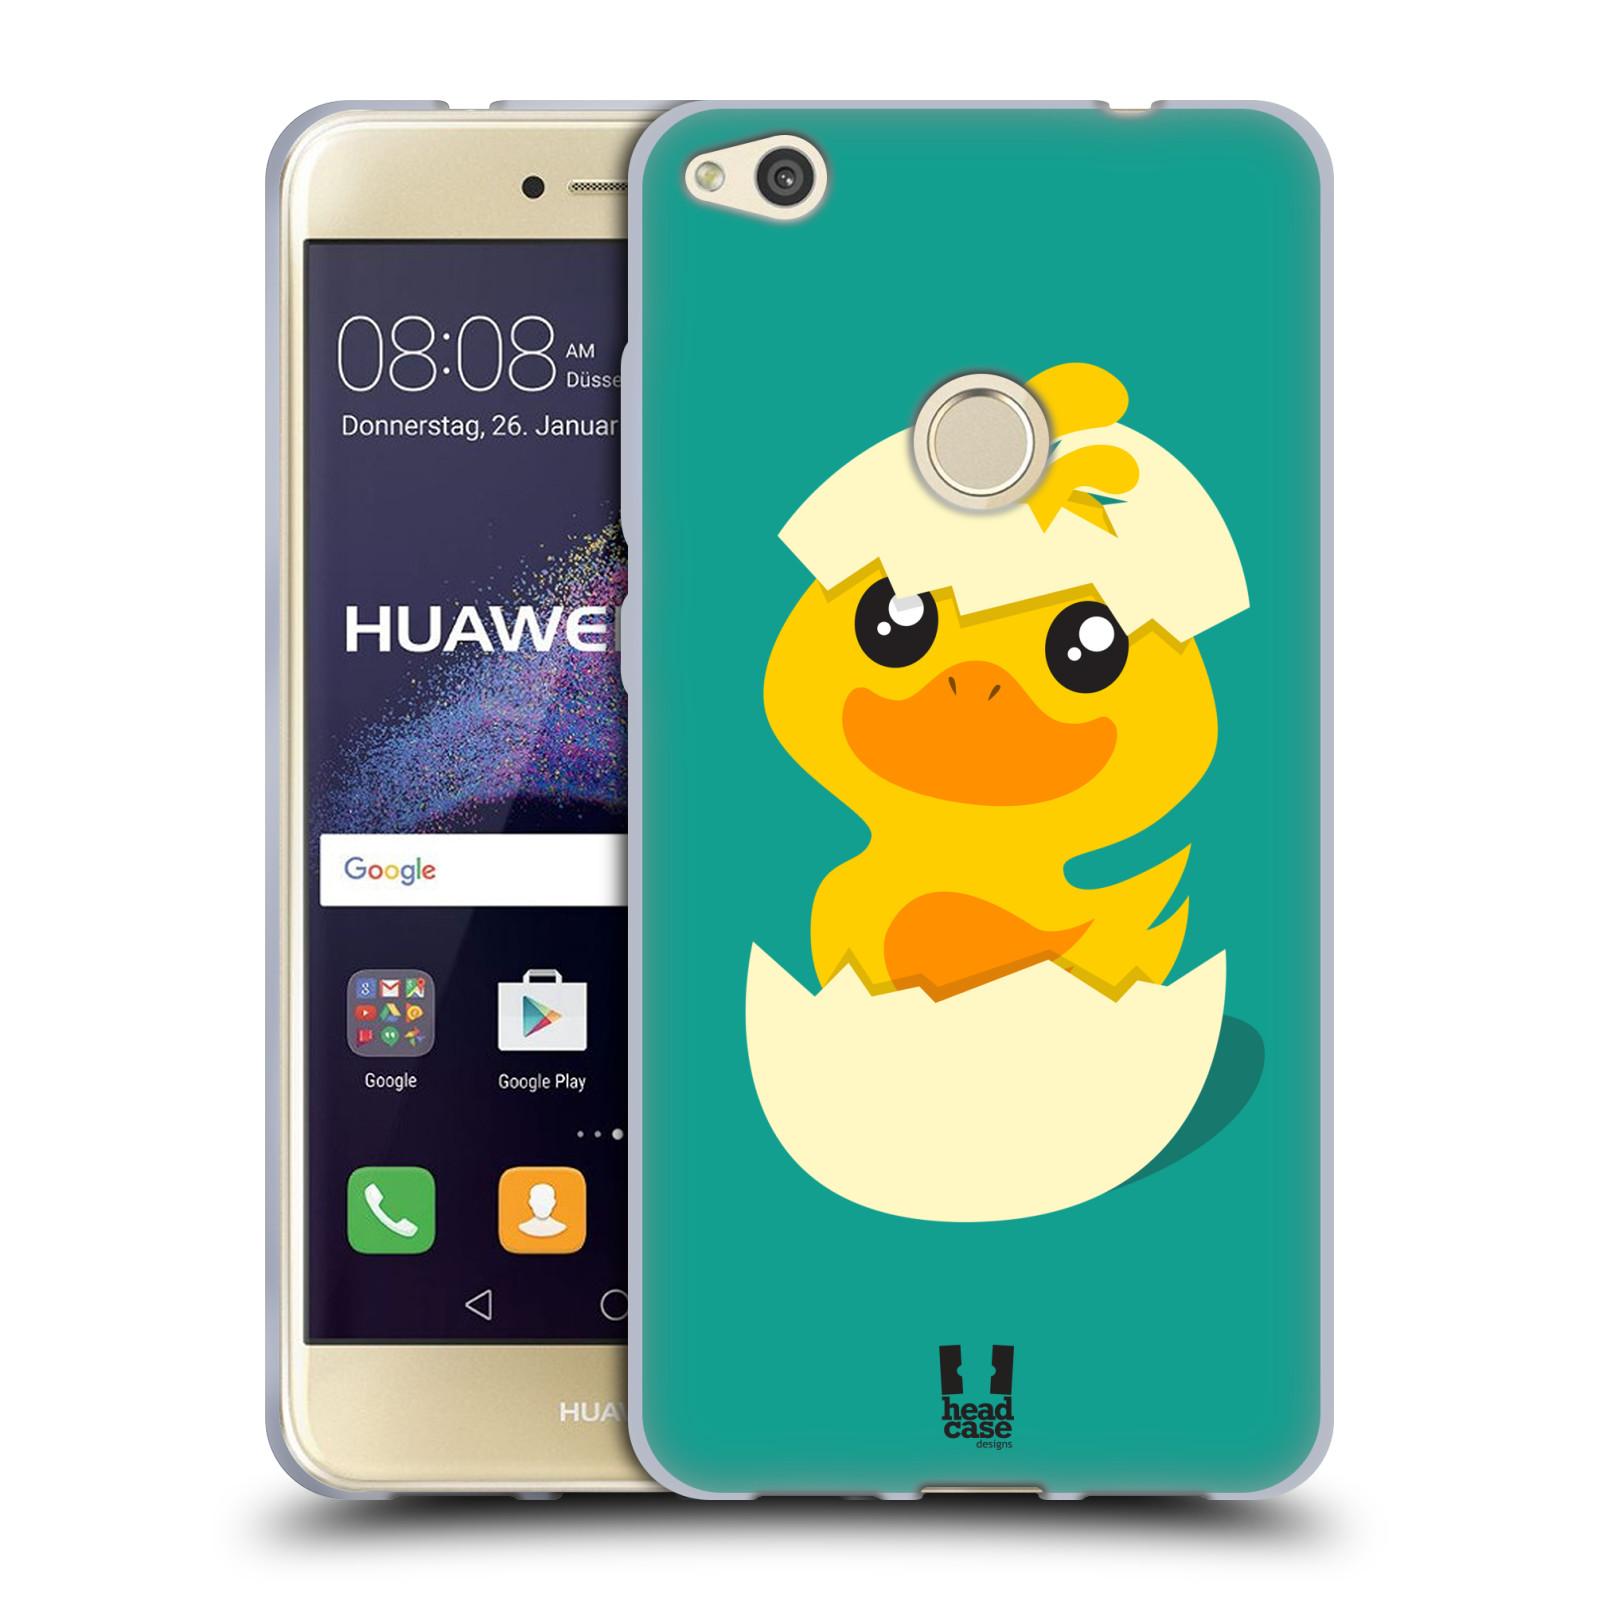 Silikonové pouzdro na mobil Huawei P9 Lite (2017) HEAD CASE KACHNIČKA Z VAJÍČKA (Silikonový kryt či obal na mobilní telefon Huawei P9 Lite 2017)